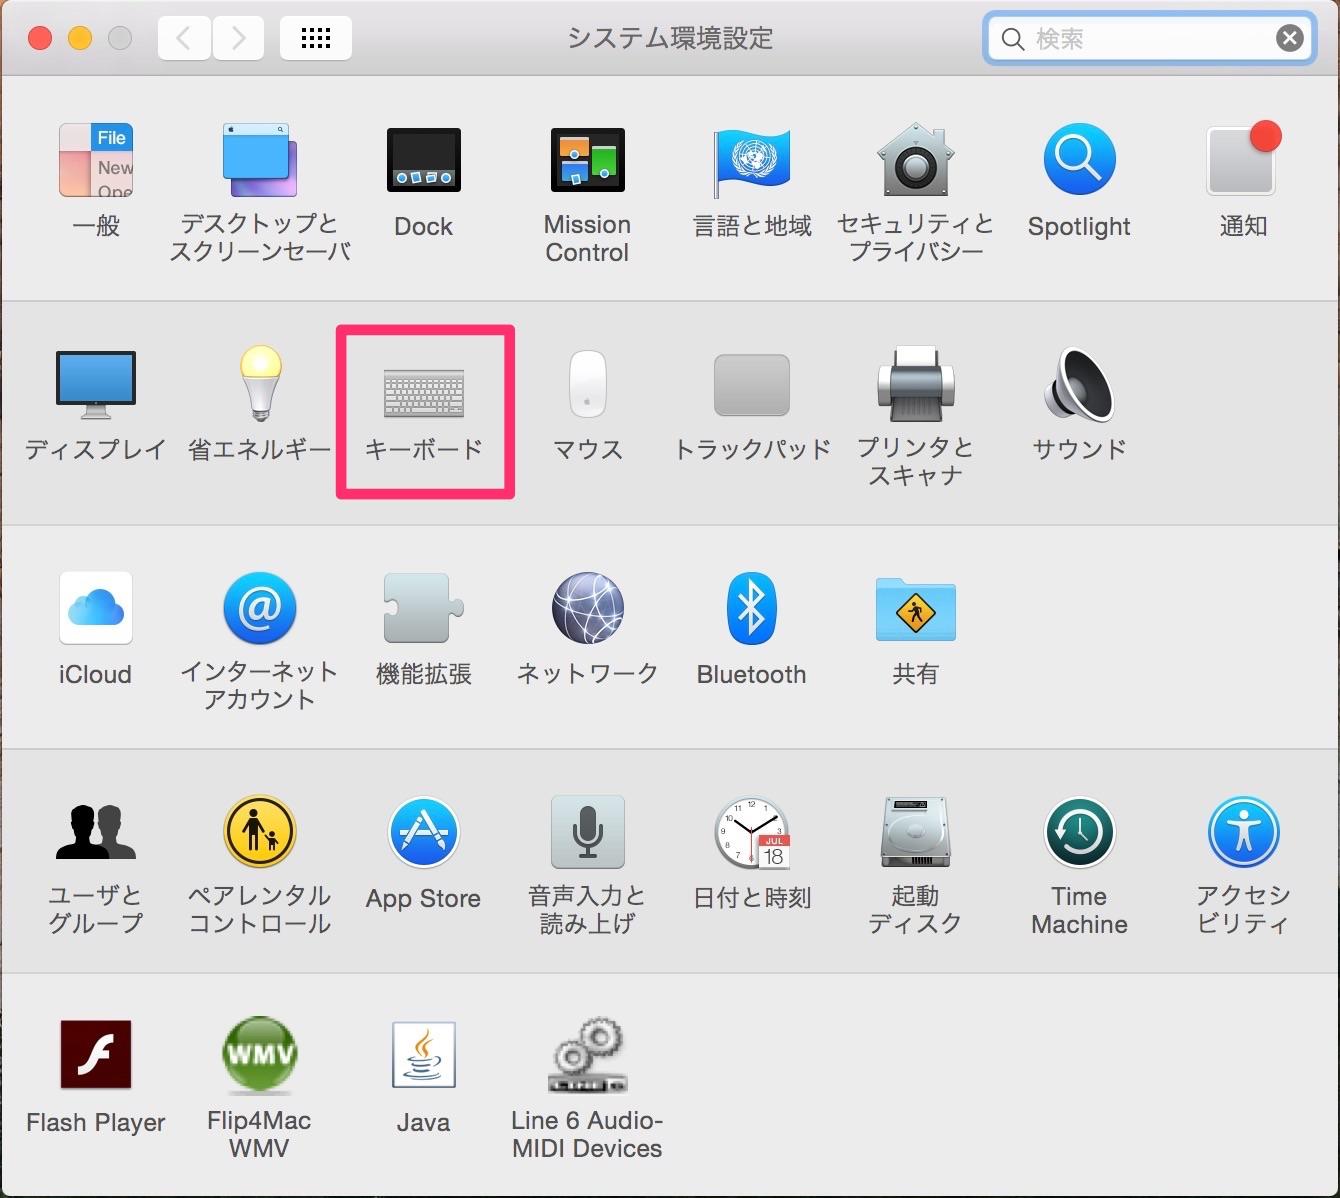 Google日本語入力以外のIMEはいらん!Macのキーボード入力で他のIMEを削除する方法